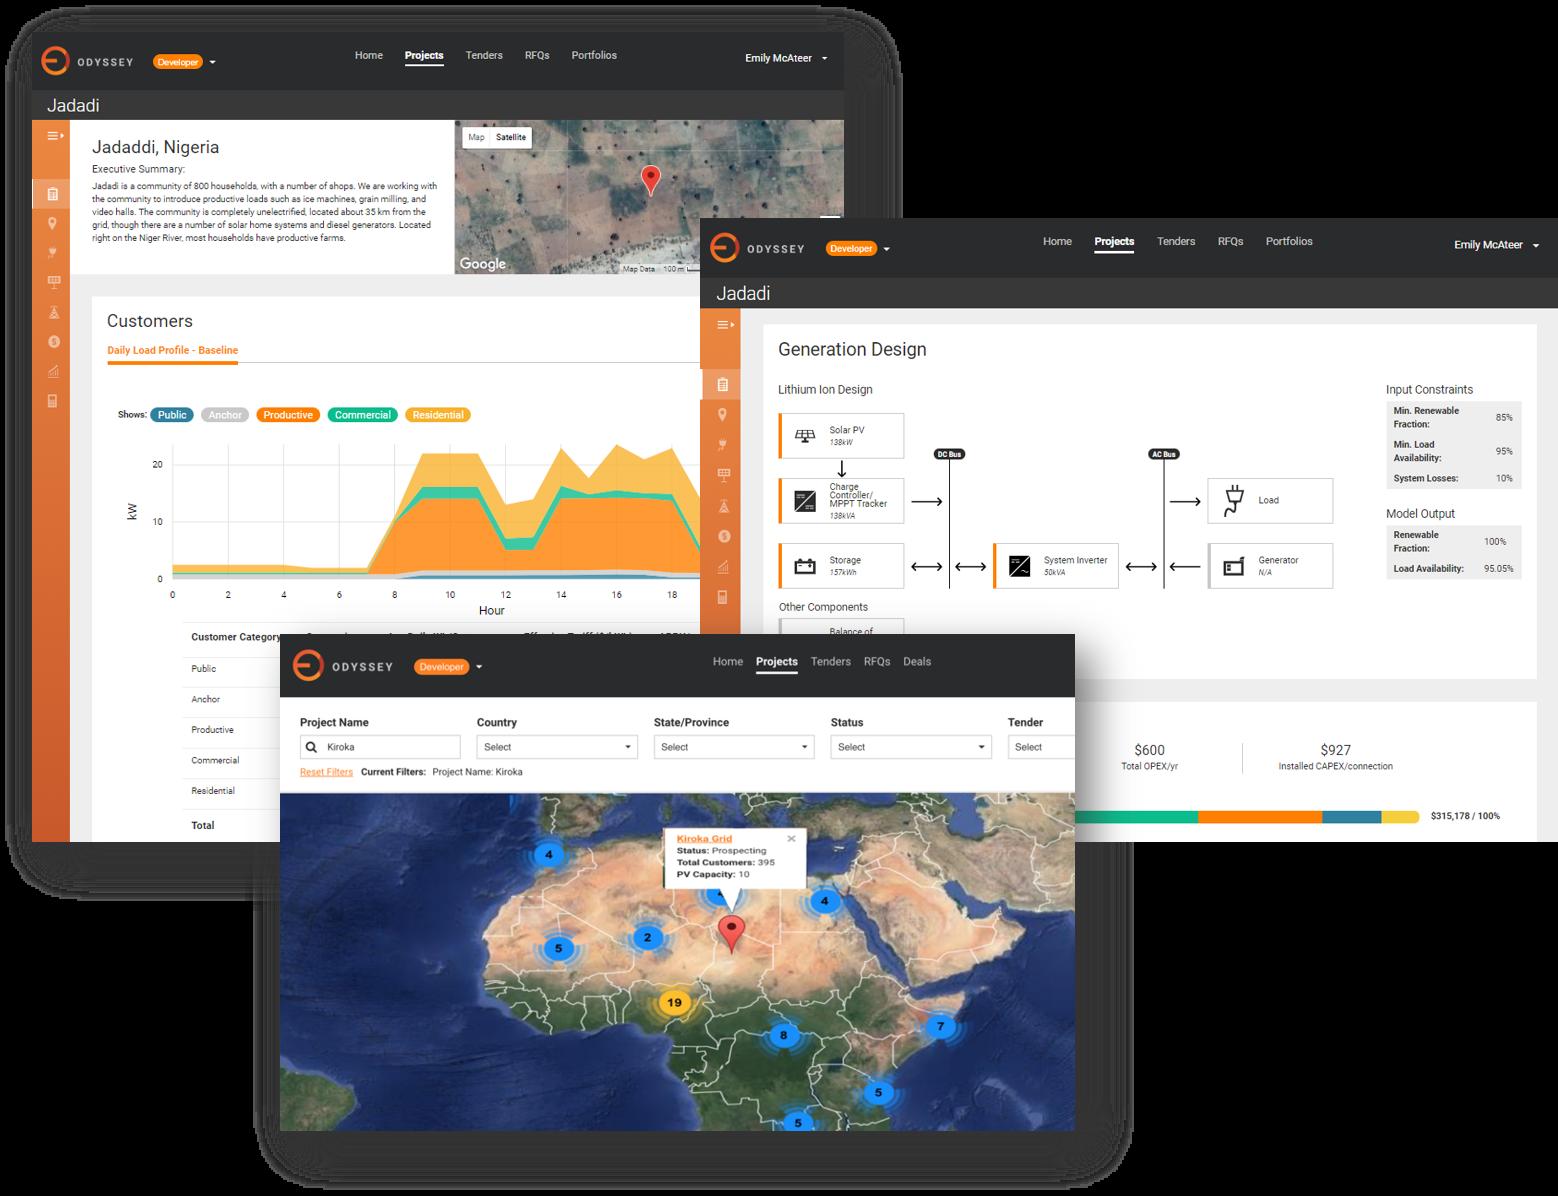 ARE Newsletter June 2018: Big Data & Analytics | The Alliance for